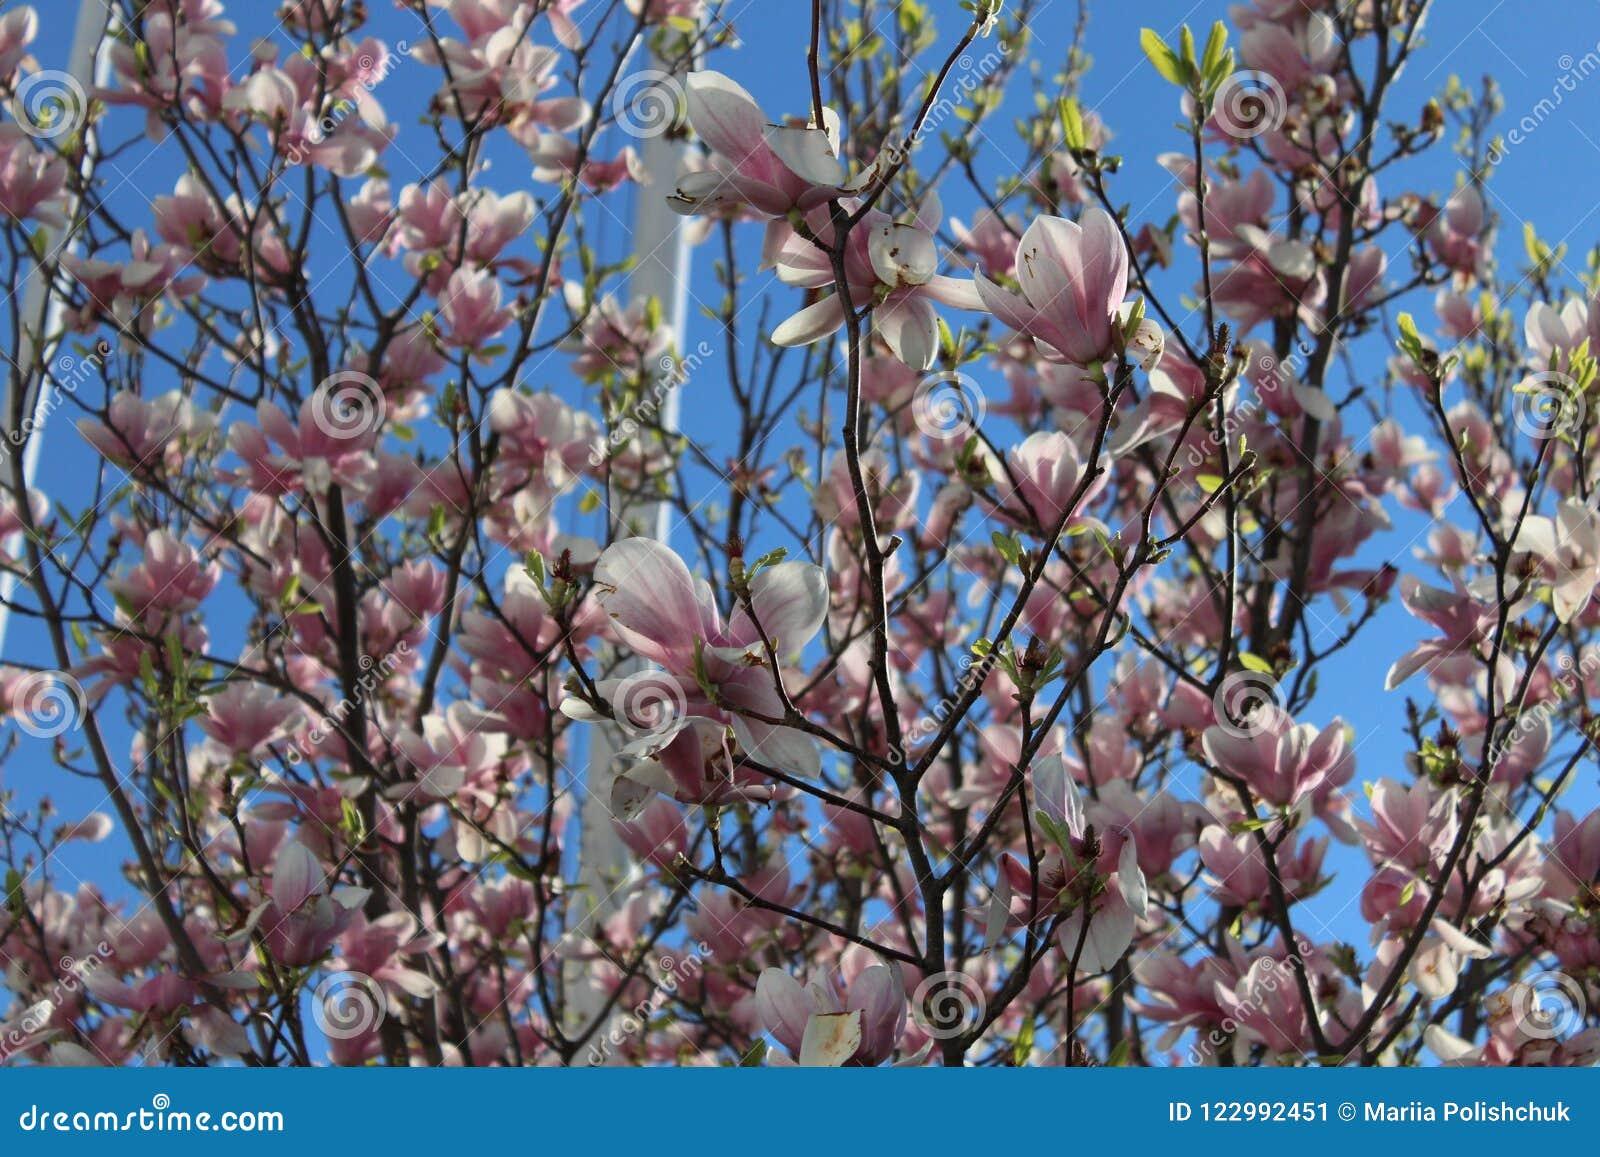 Tree With Pink Flowers Magnolia Stock Image Image Of Flamingo